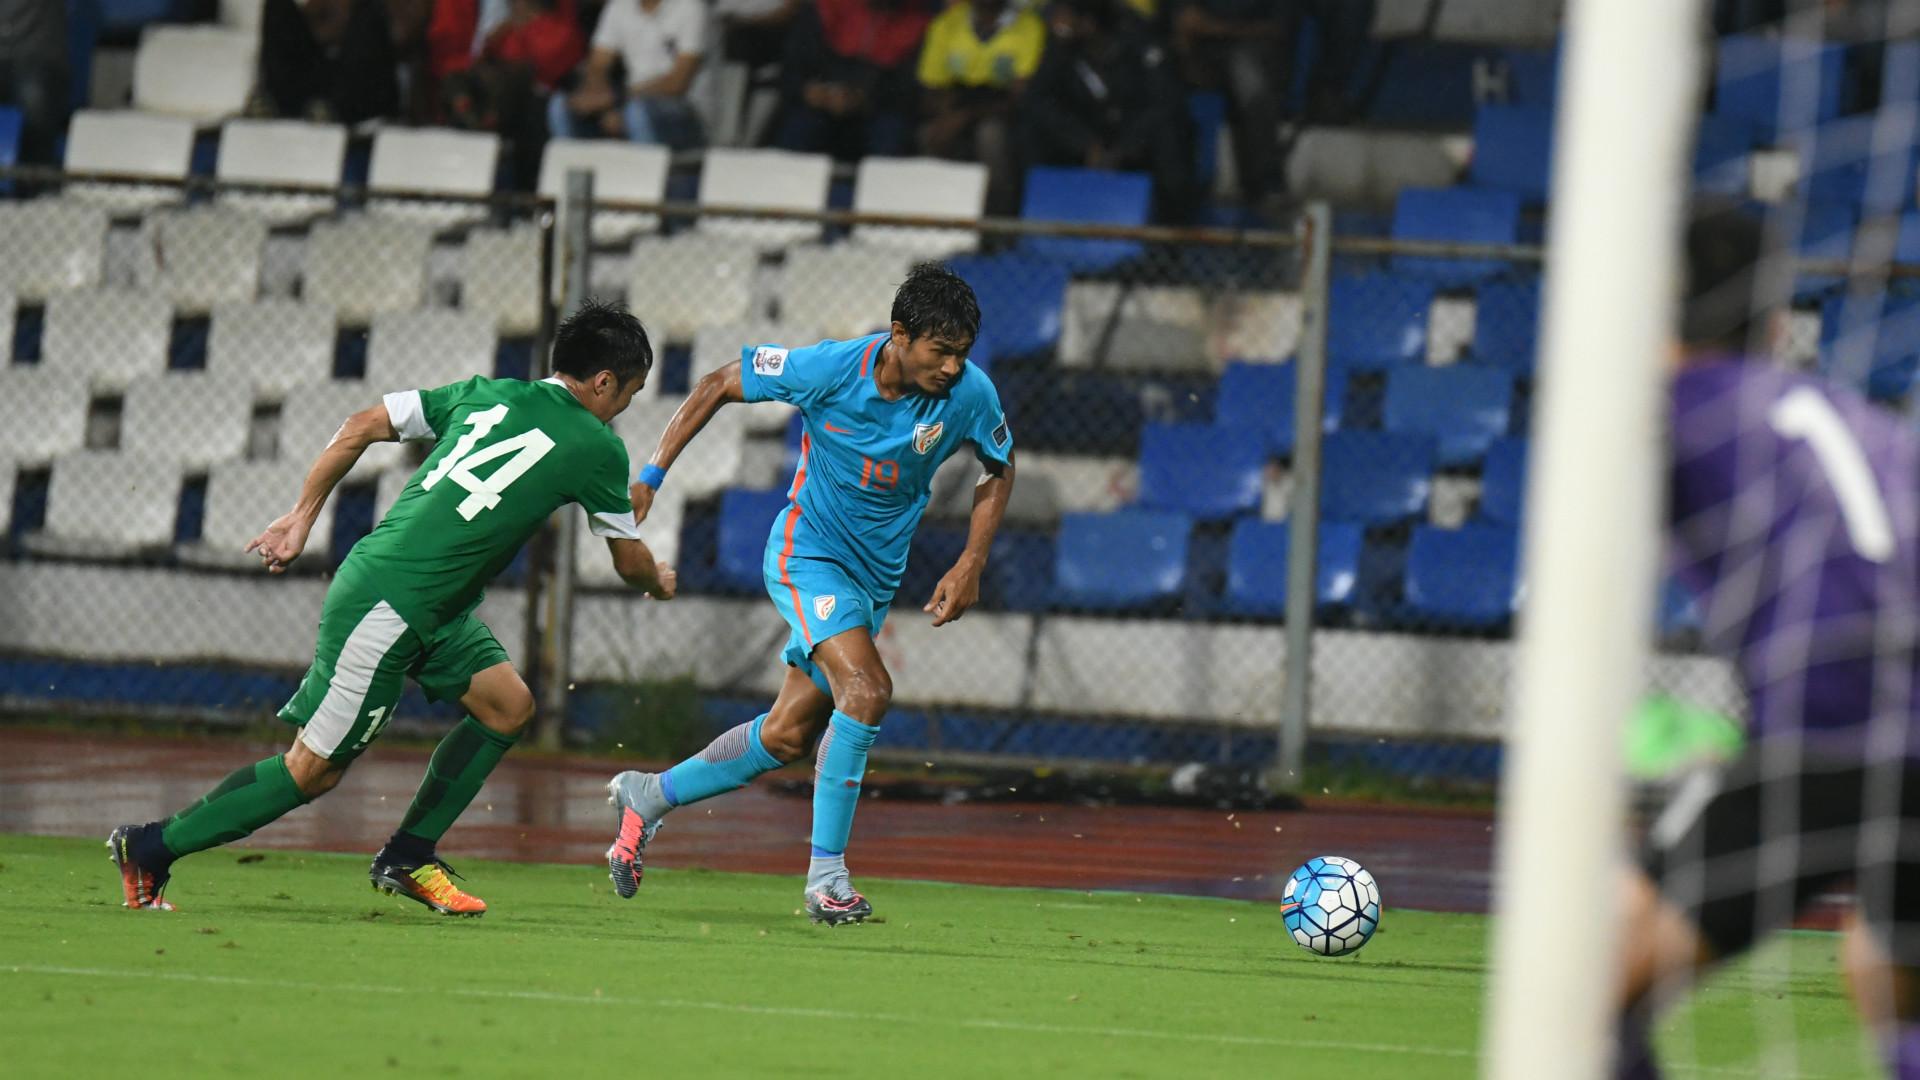 Halicharan Narzary India Macau 2019 AFC Asian Cup qualifiers